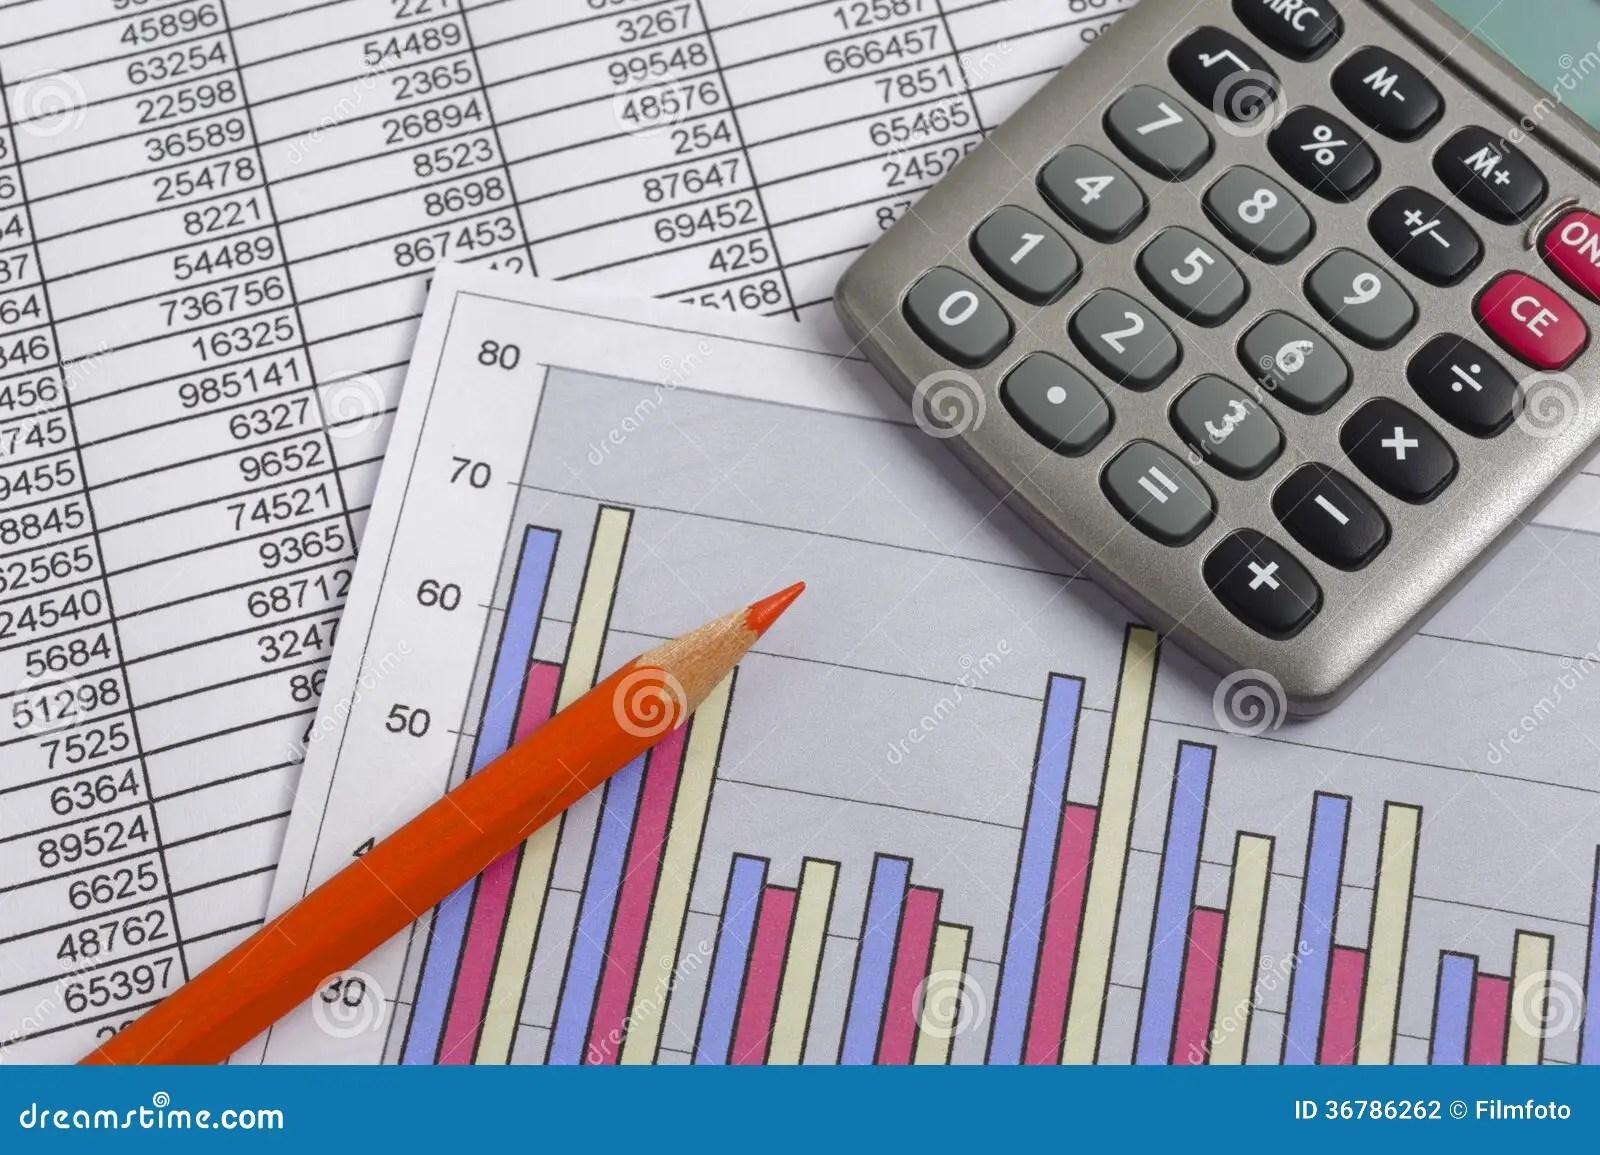 Finance Business Calculation Stock Photo